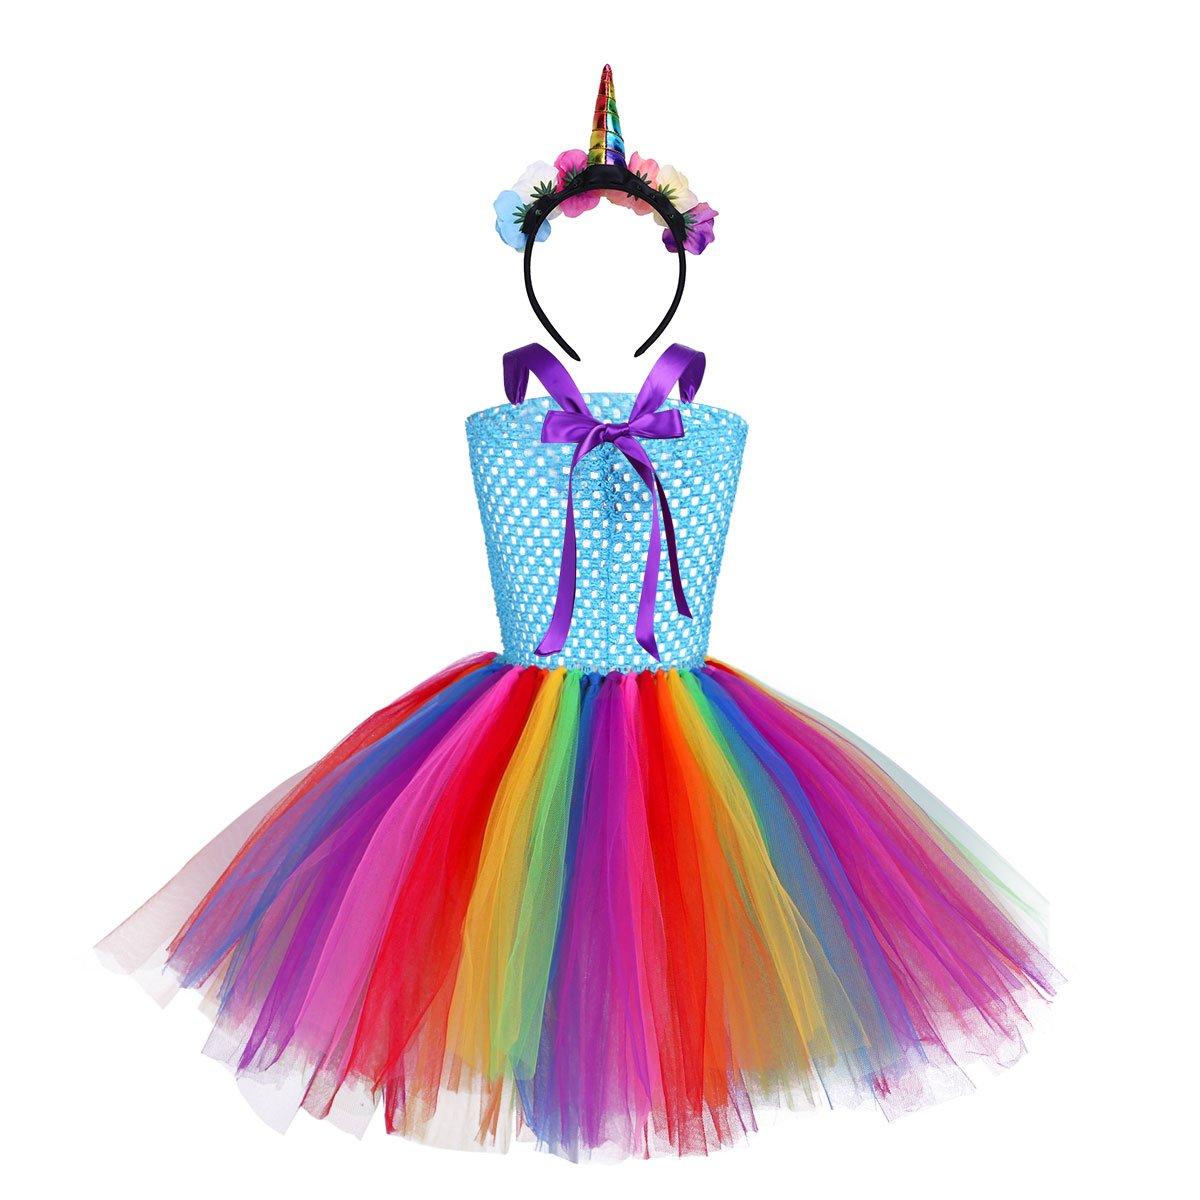 dPois Vestido de Unicornio Fiesta Boda Ni/ña Tutu Princesa Disfraz de Cosplay Conjunto con Diadema Traje de Ceremonia Carnaval Bautizo Cumplea/ños Comuni/ón Actuaci/ón 2-12 A/ños